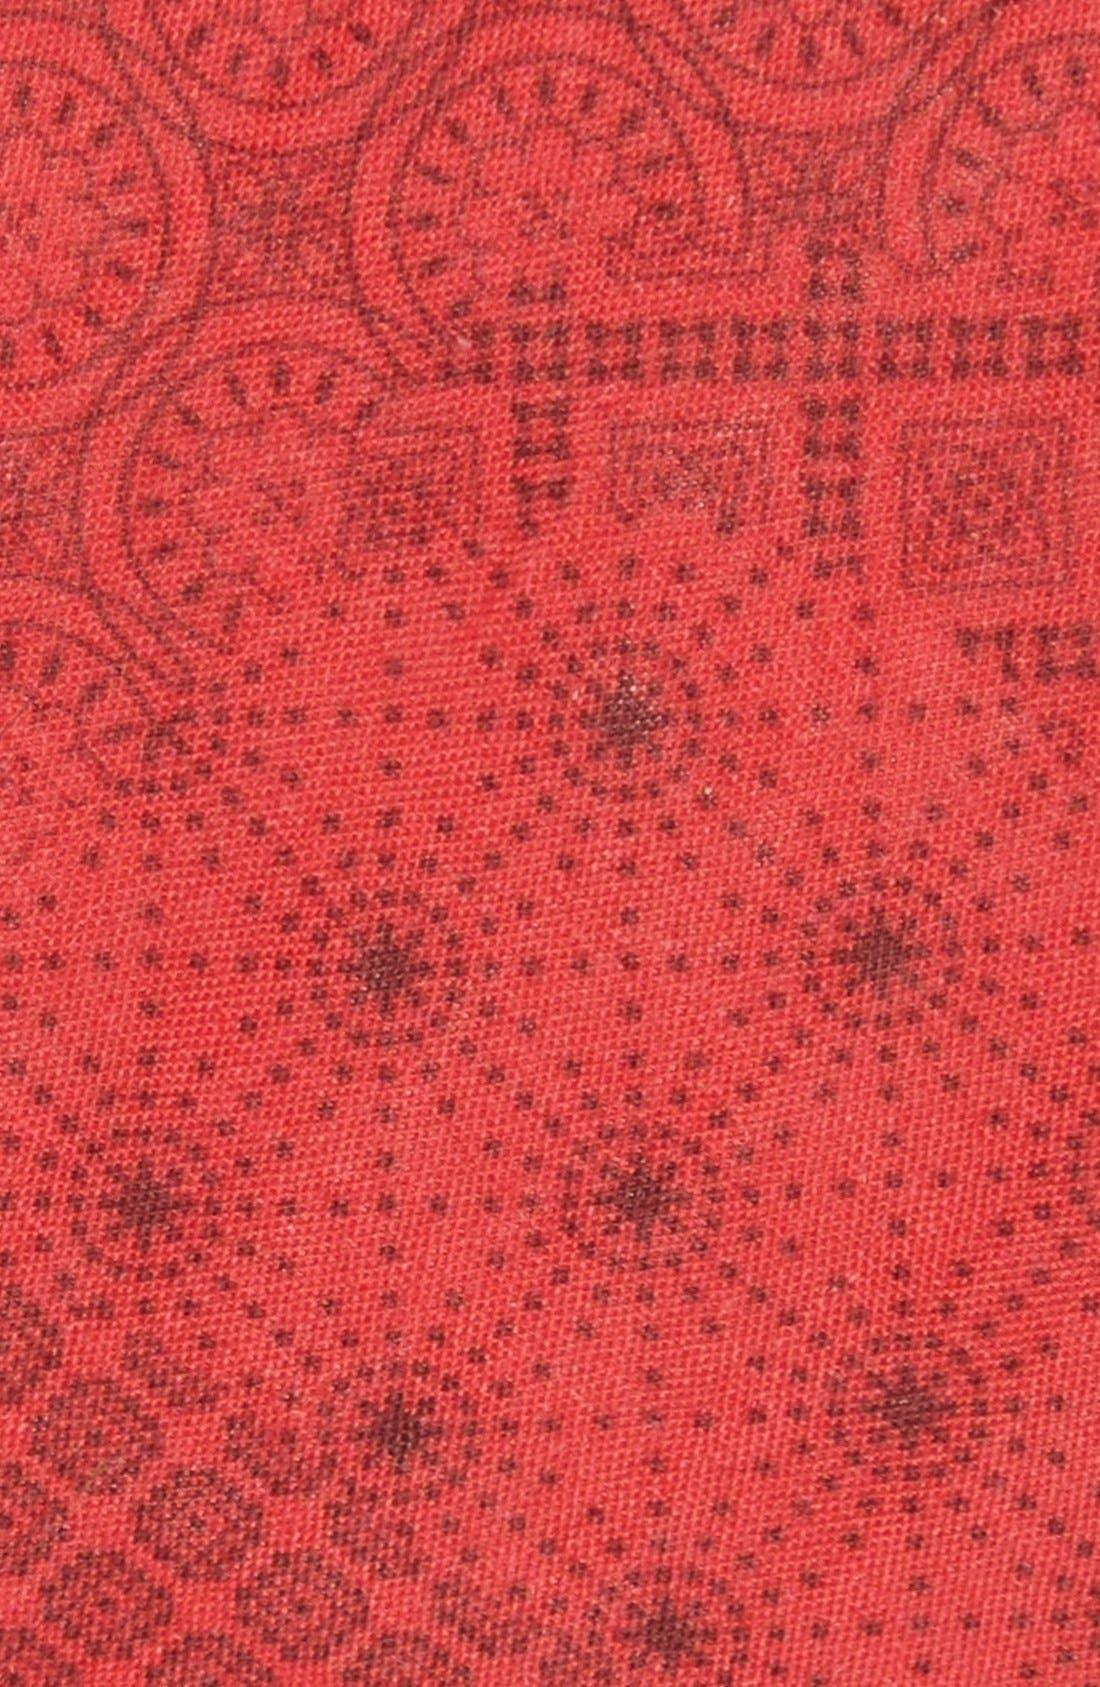 Alternate Image 2  - EDIT by The Tie Bar Geometric Linen Tie (Nordstrom Exclusive)